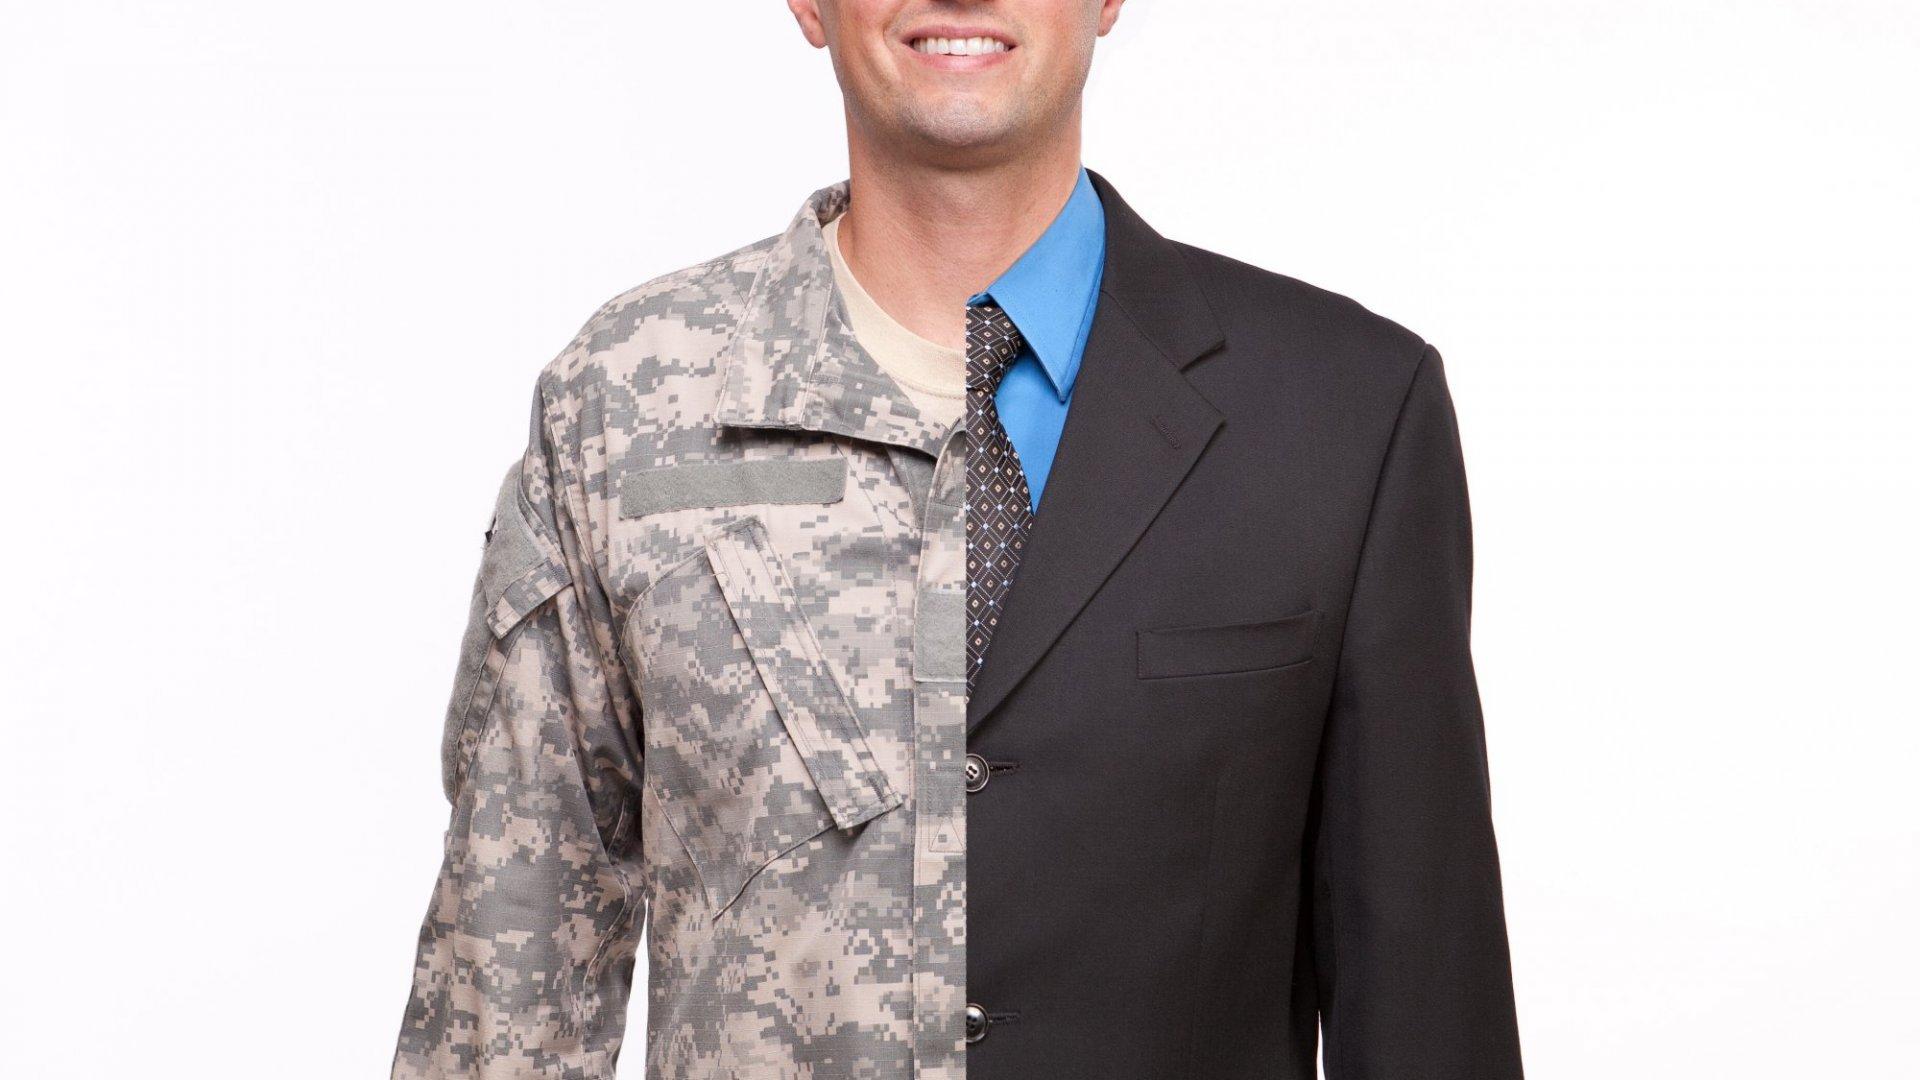 3 Entrepreneur Veterans Explain How Military Experience Is Good for Business